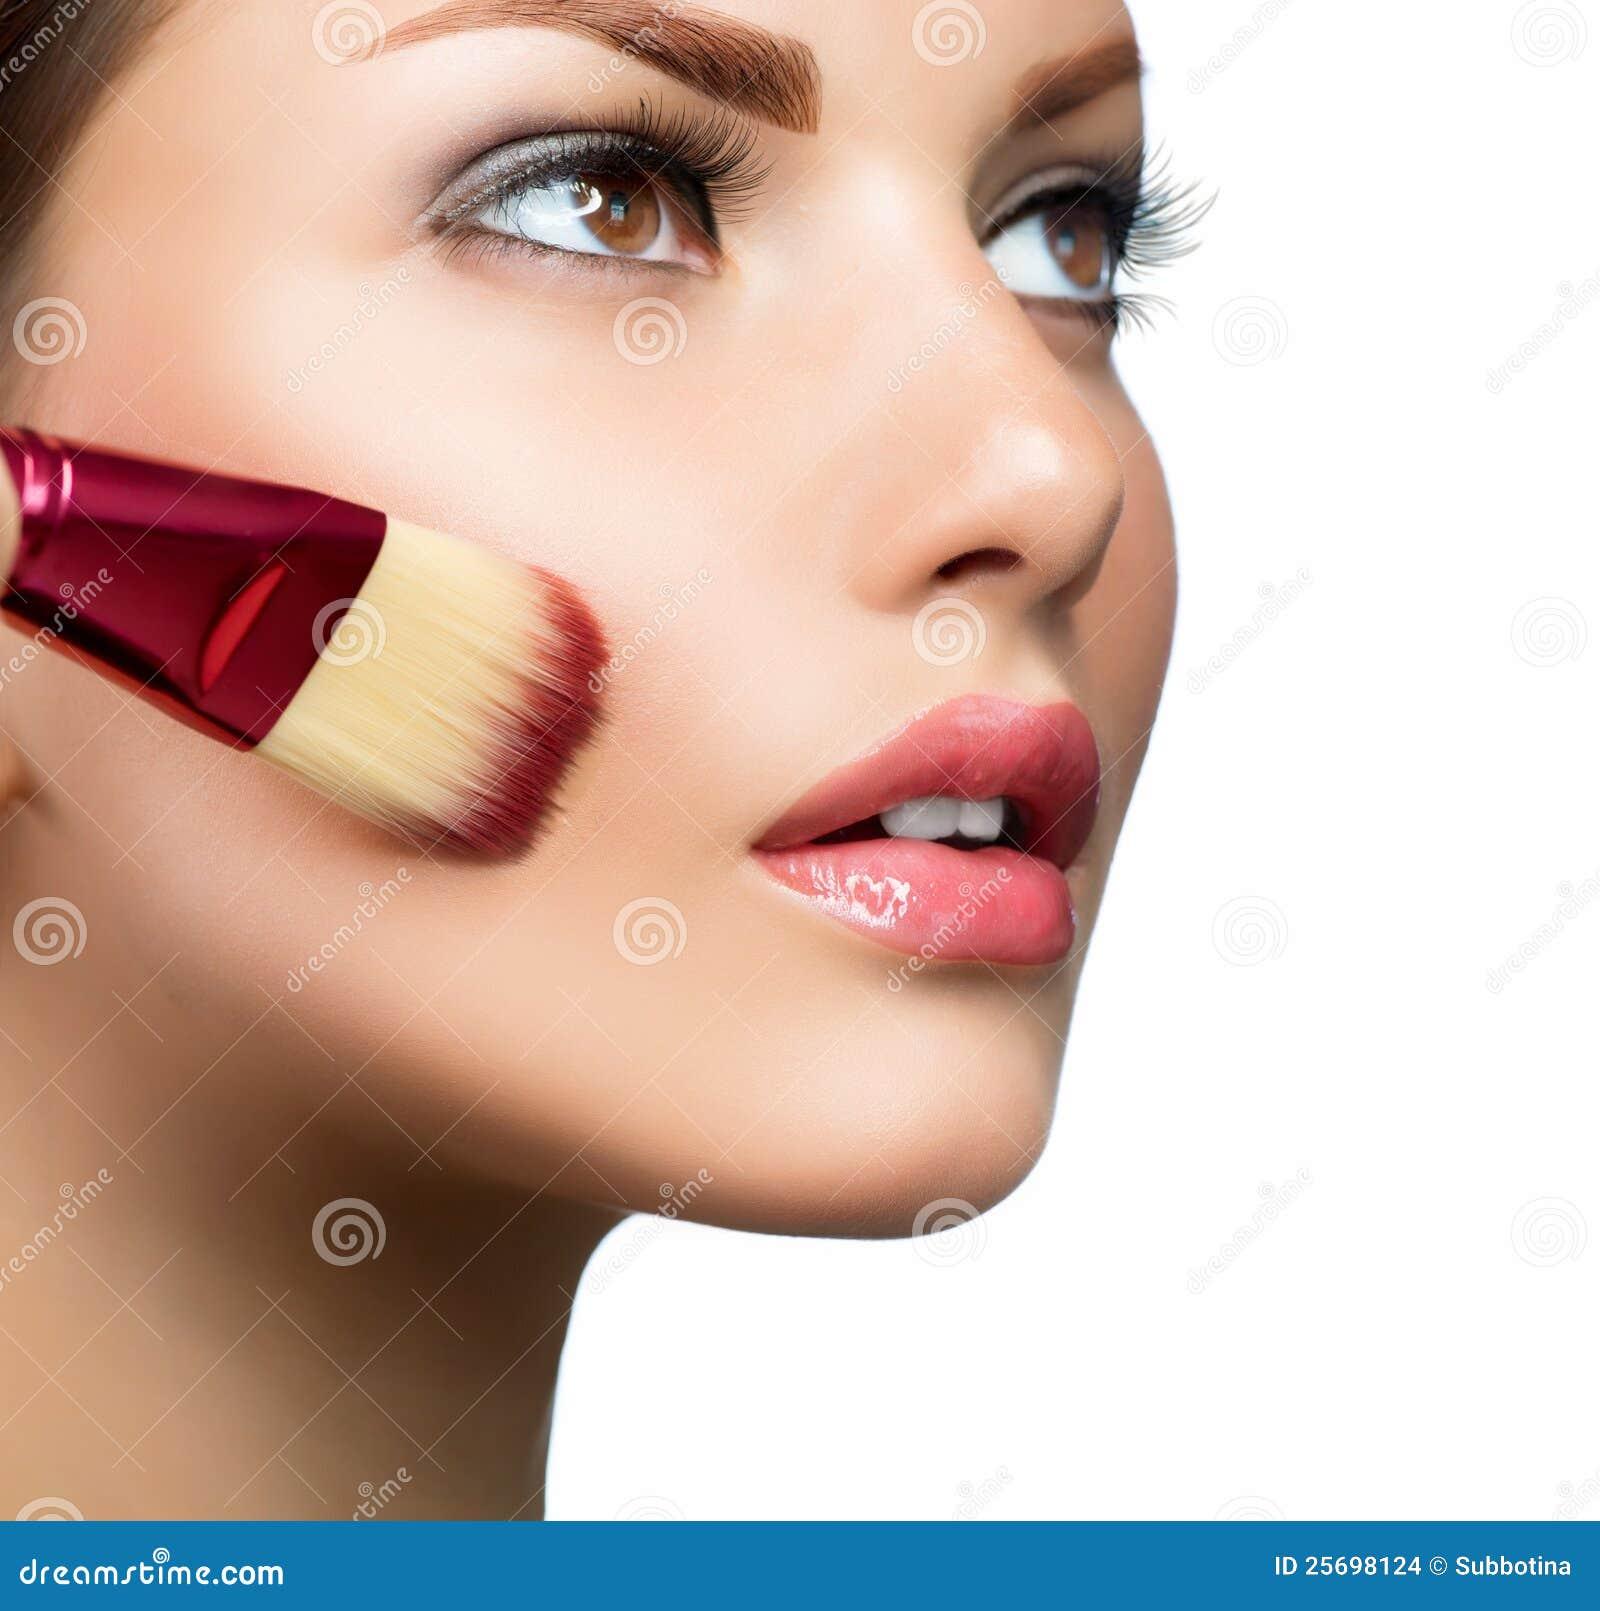 Maquillaje. Cara del maquillaje